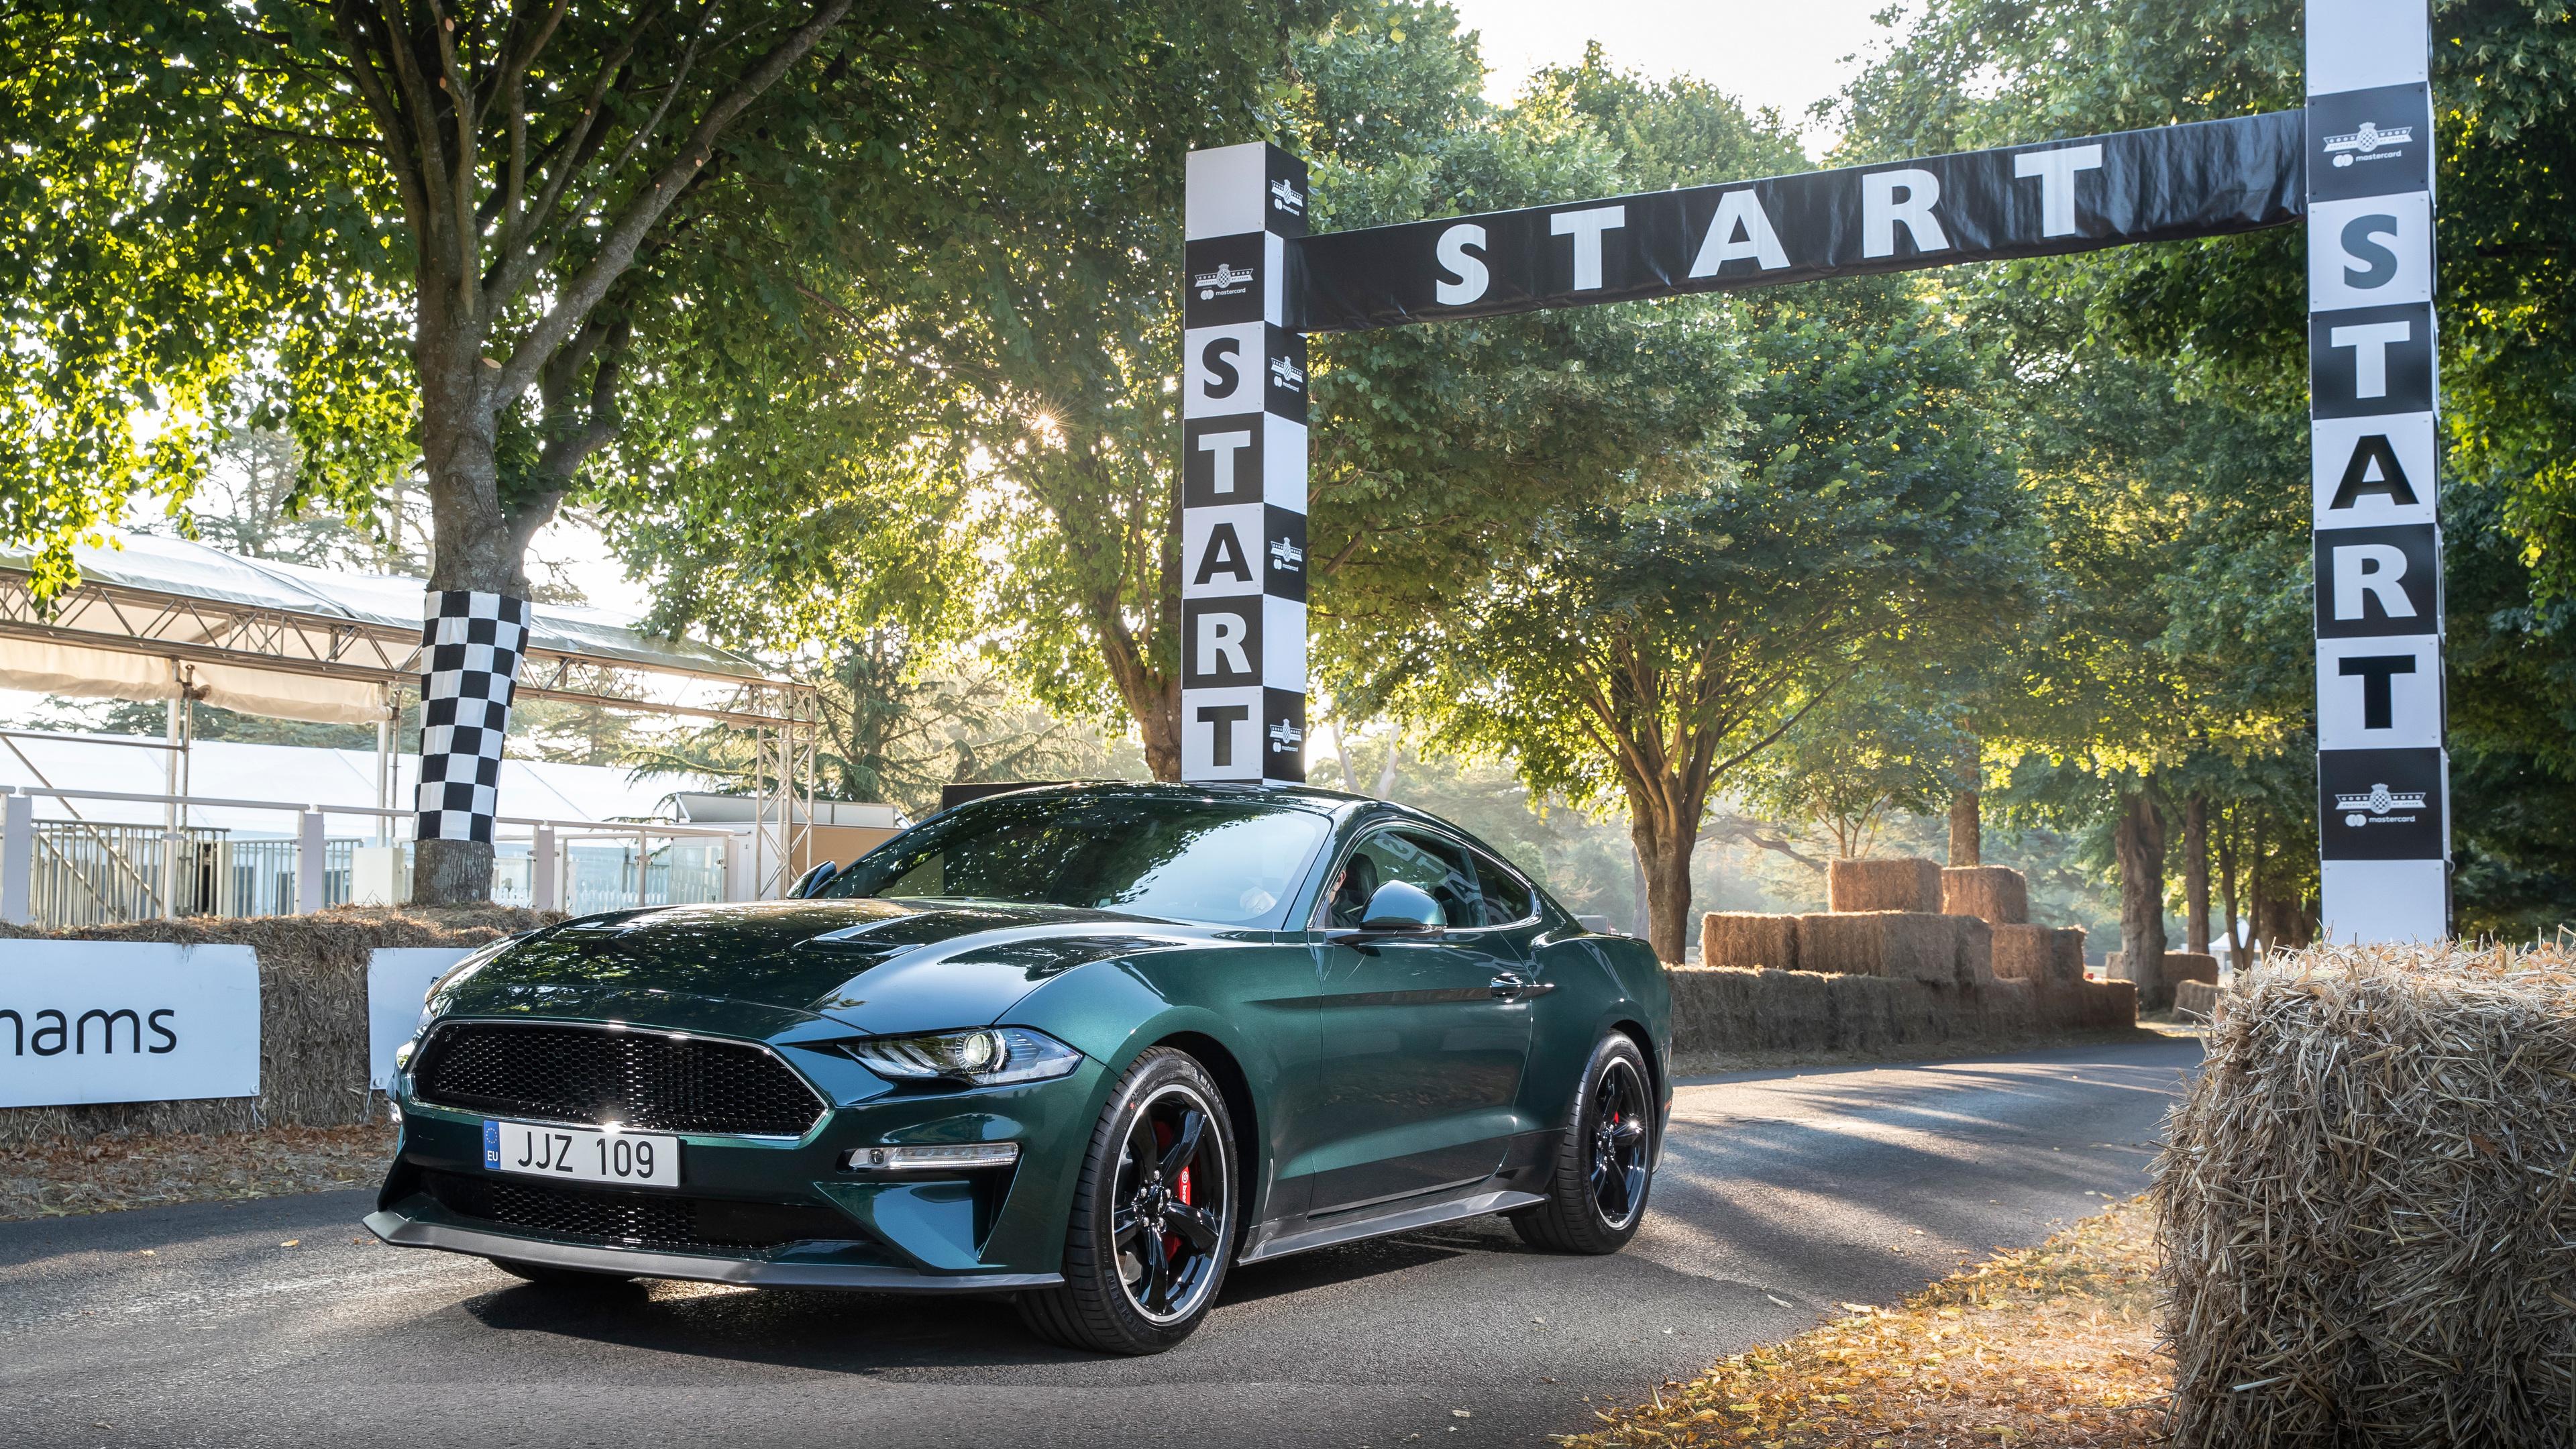 Wallpaper 4k Ford Mustang Bullitt New Limited Edition 2019 2018 Cars